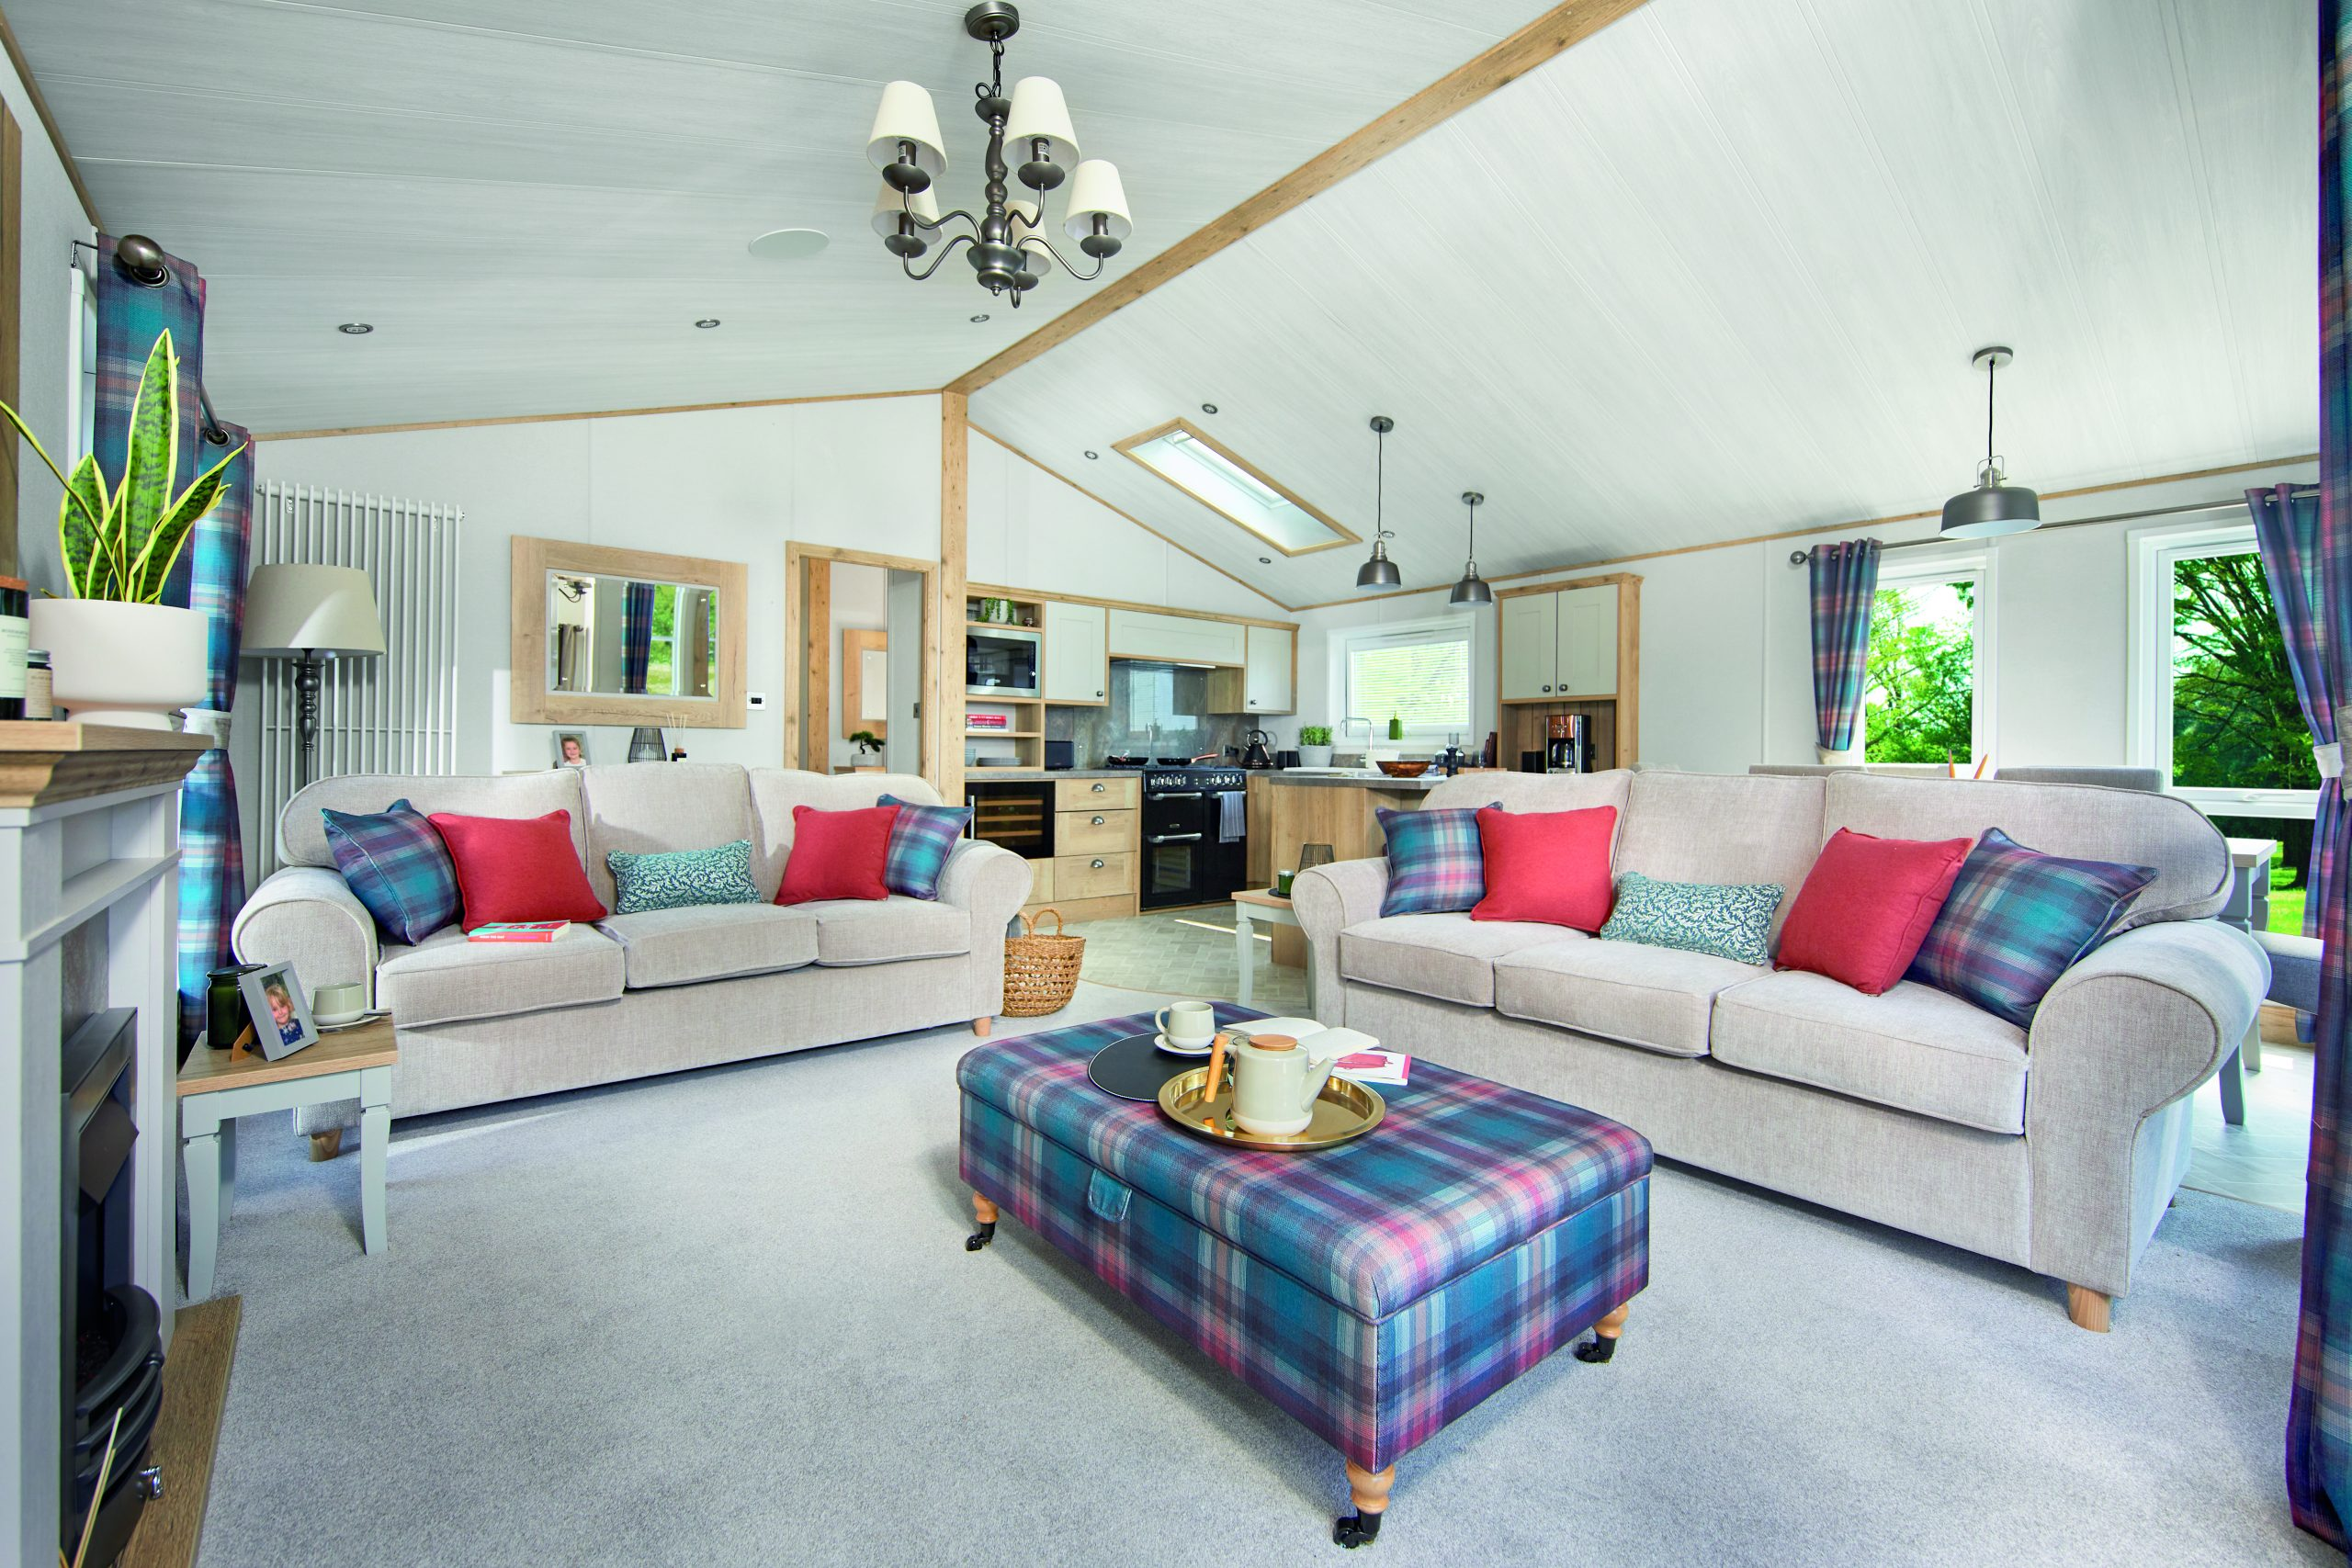 hot tub log cabin lincolnshire, holiday log cabins lincolnshire, log cabin holidays lincolnshire